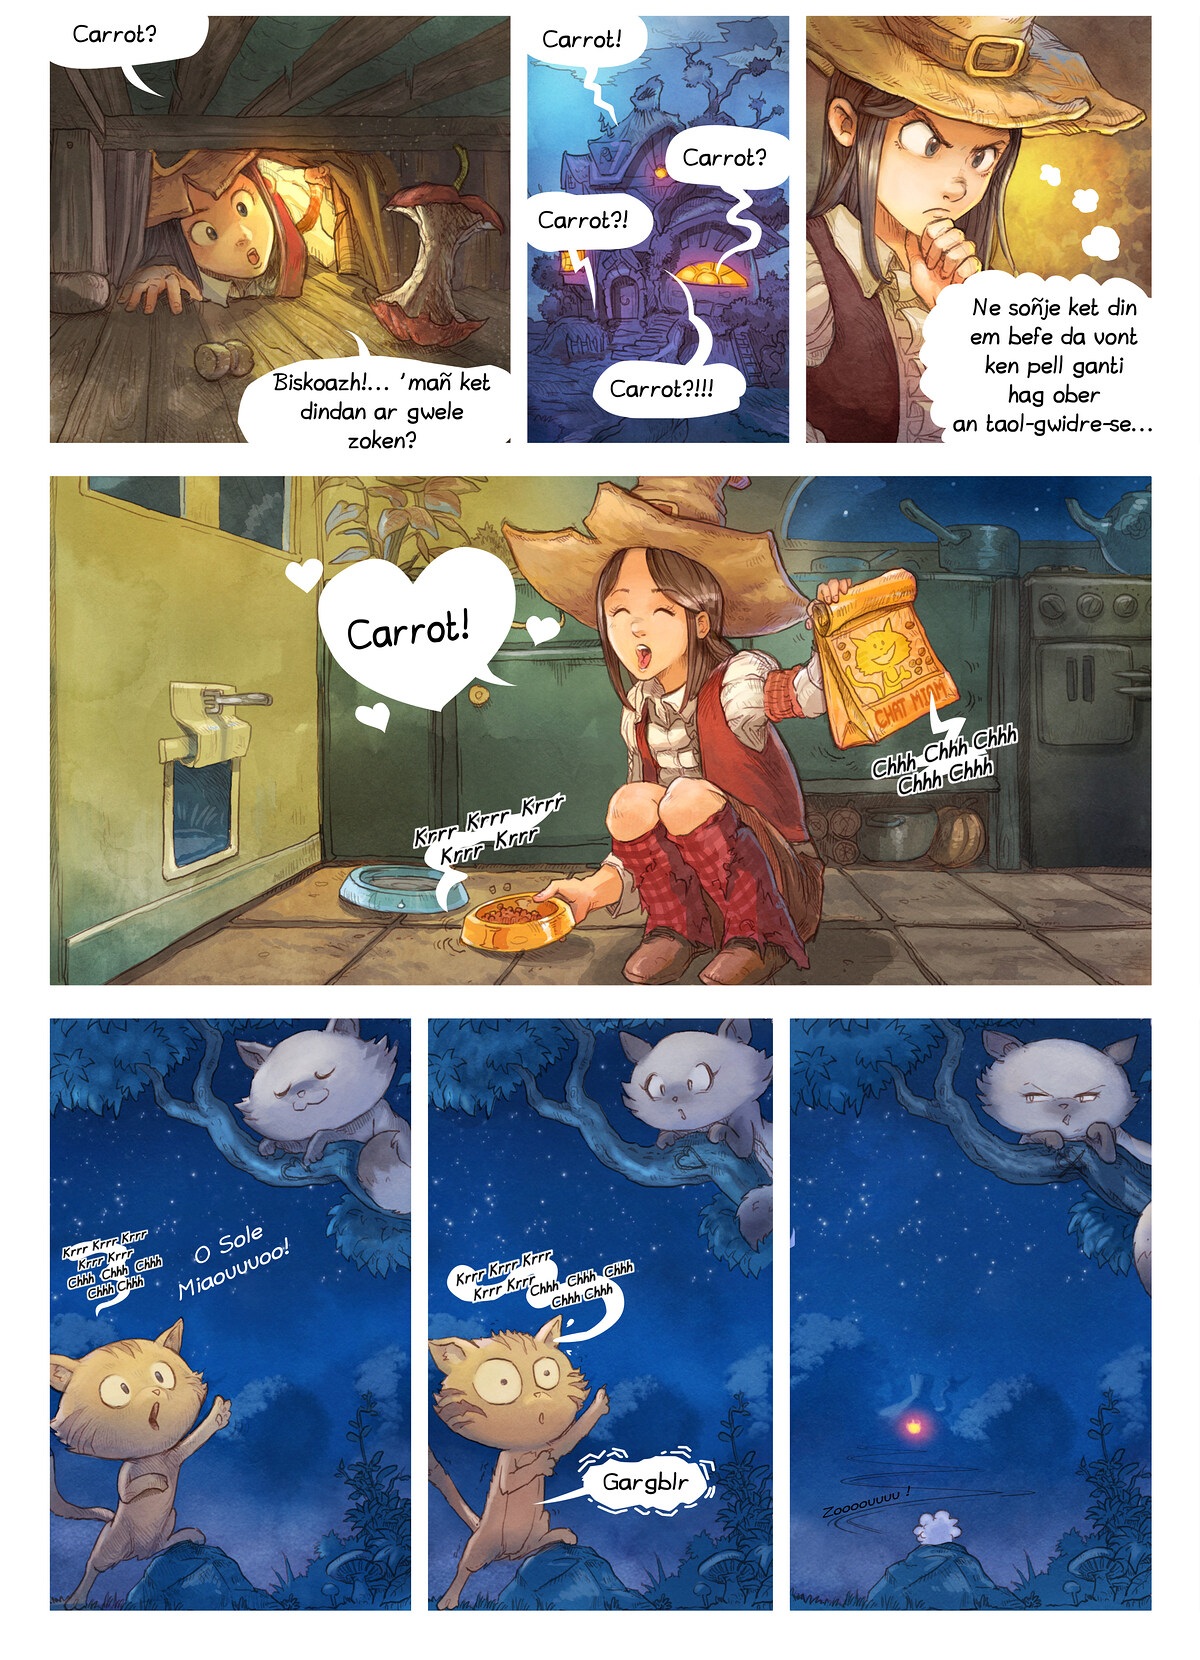 A webcomic page of Pepper&Carrot, rann 4 [br], pajenn 2